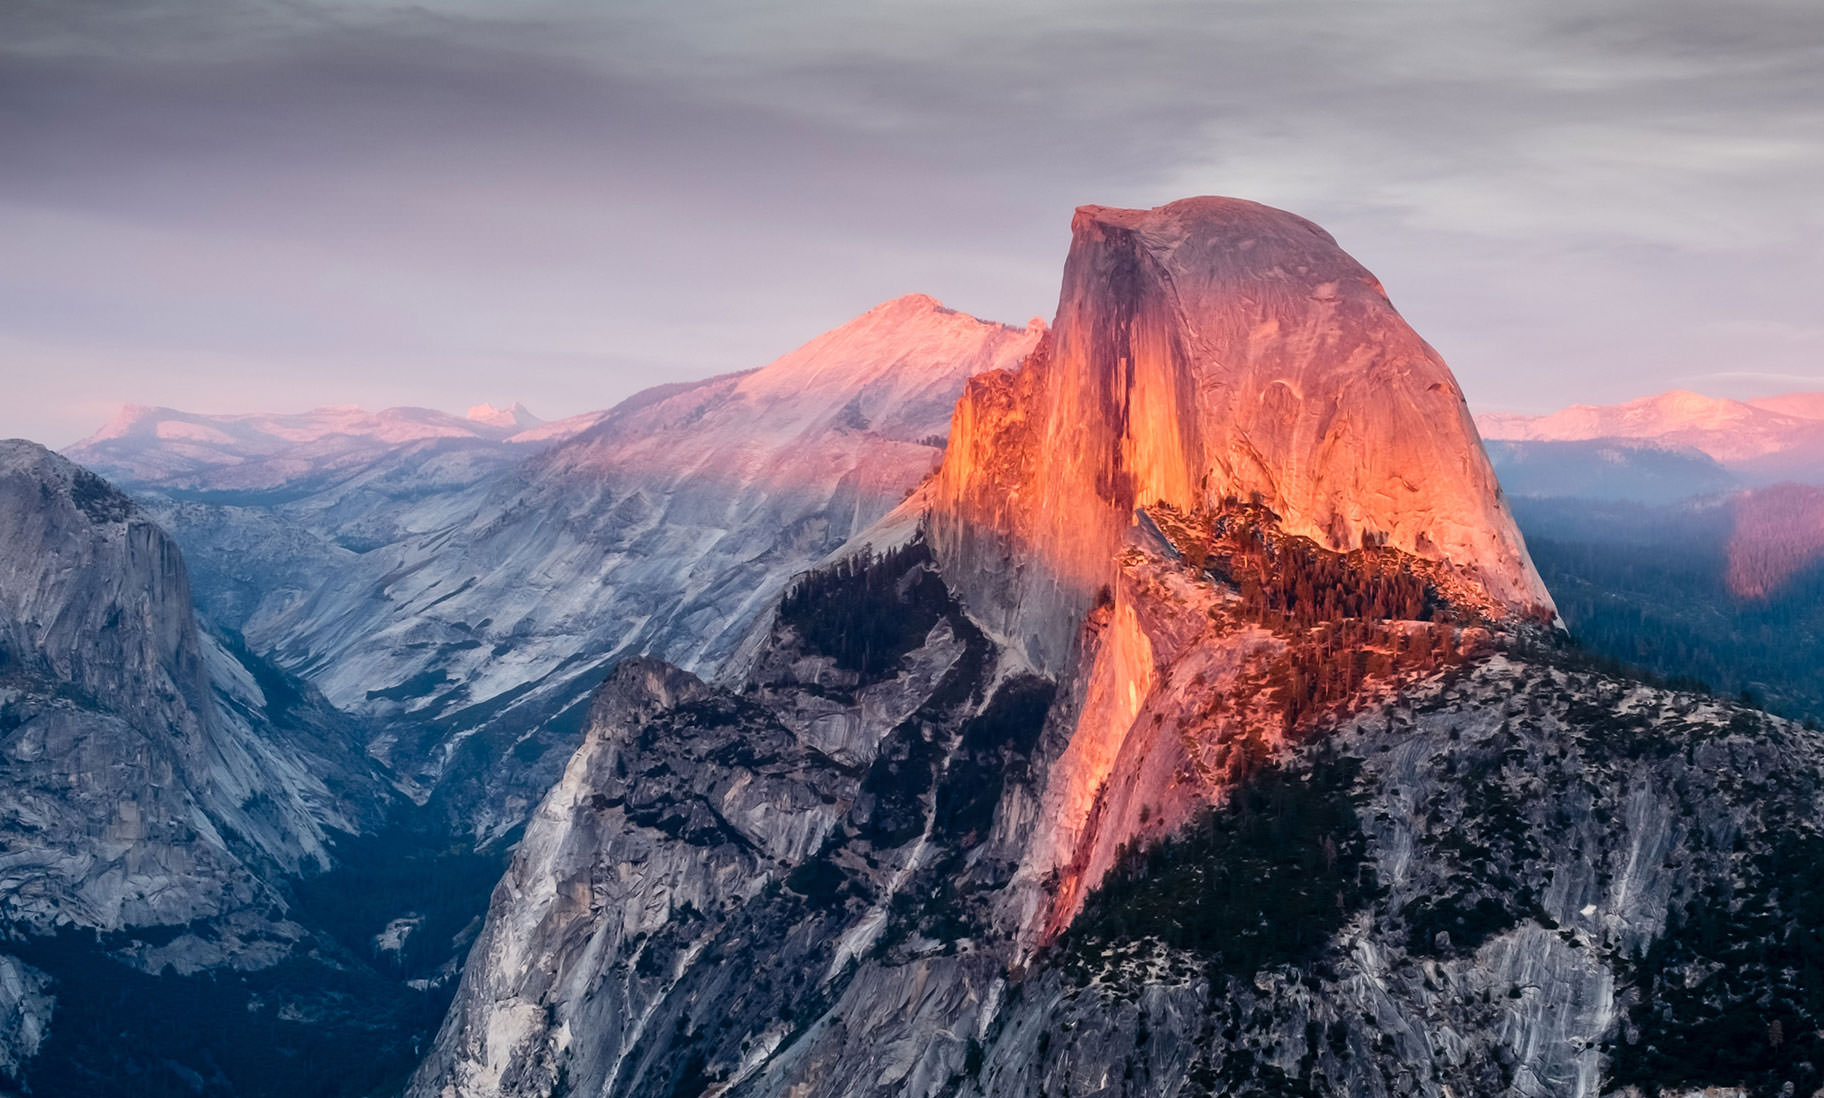 Glacier Point - Yosemite National Park, CAImage by Madhu Shesharam